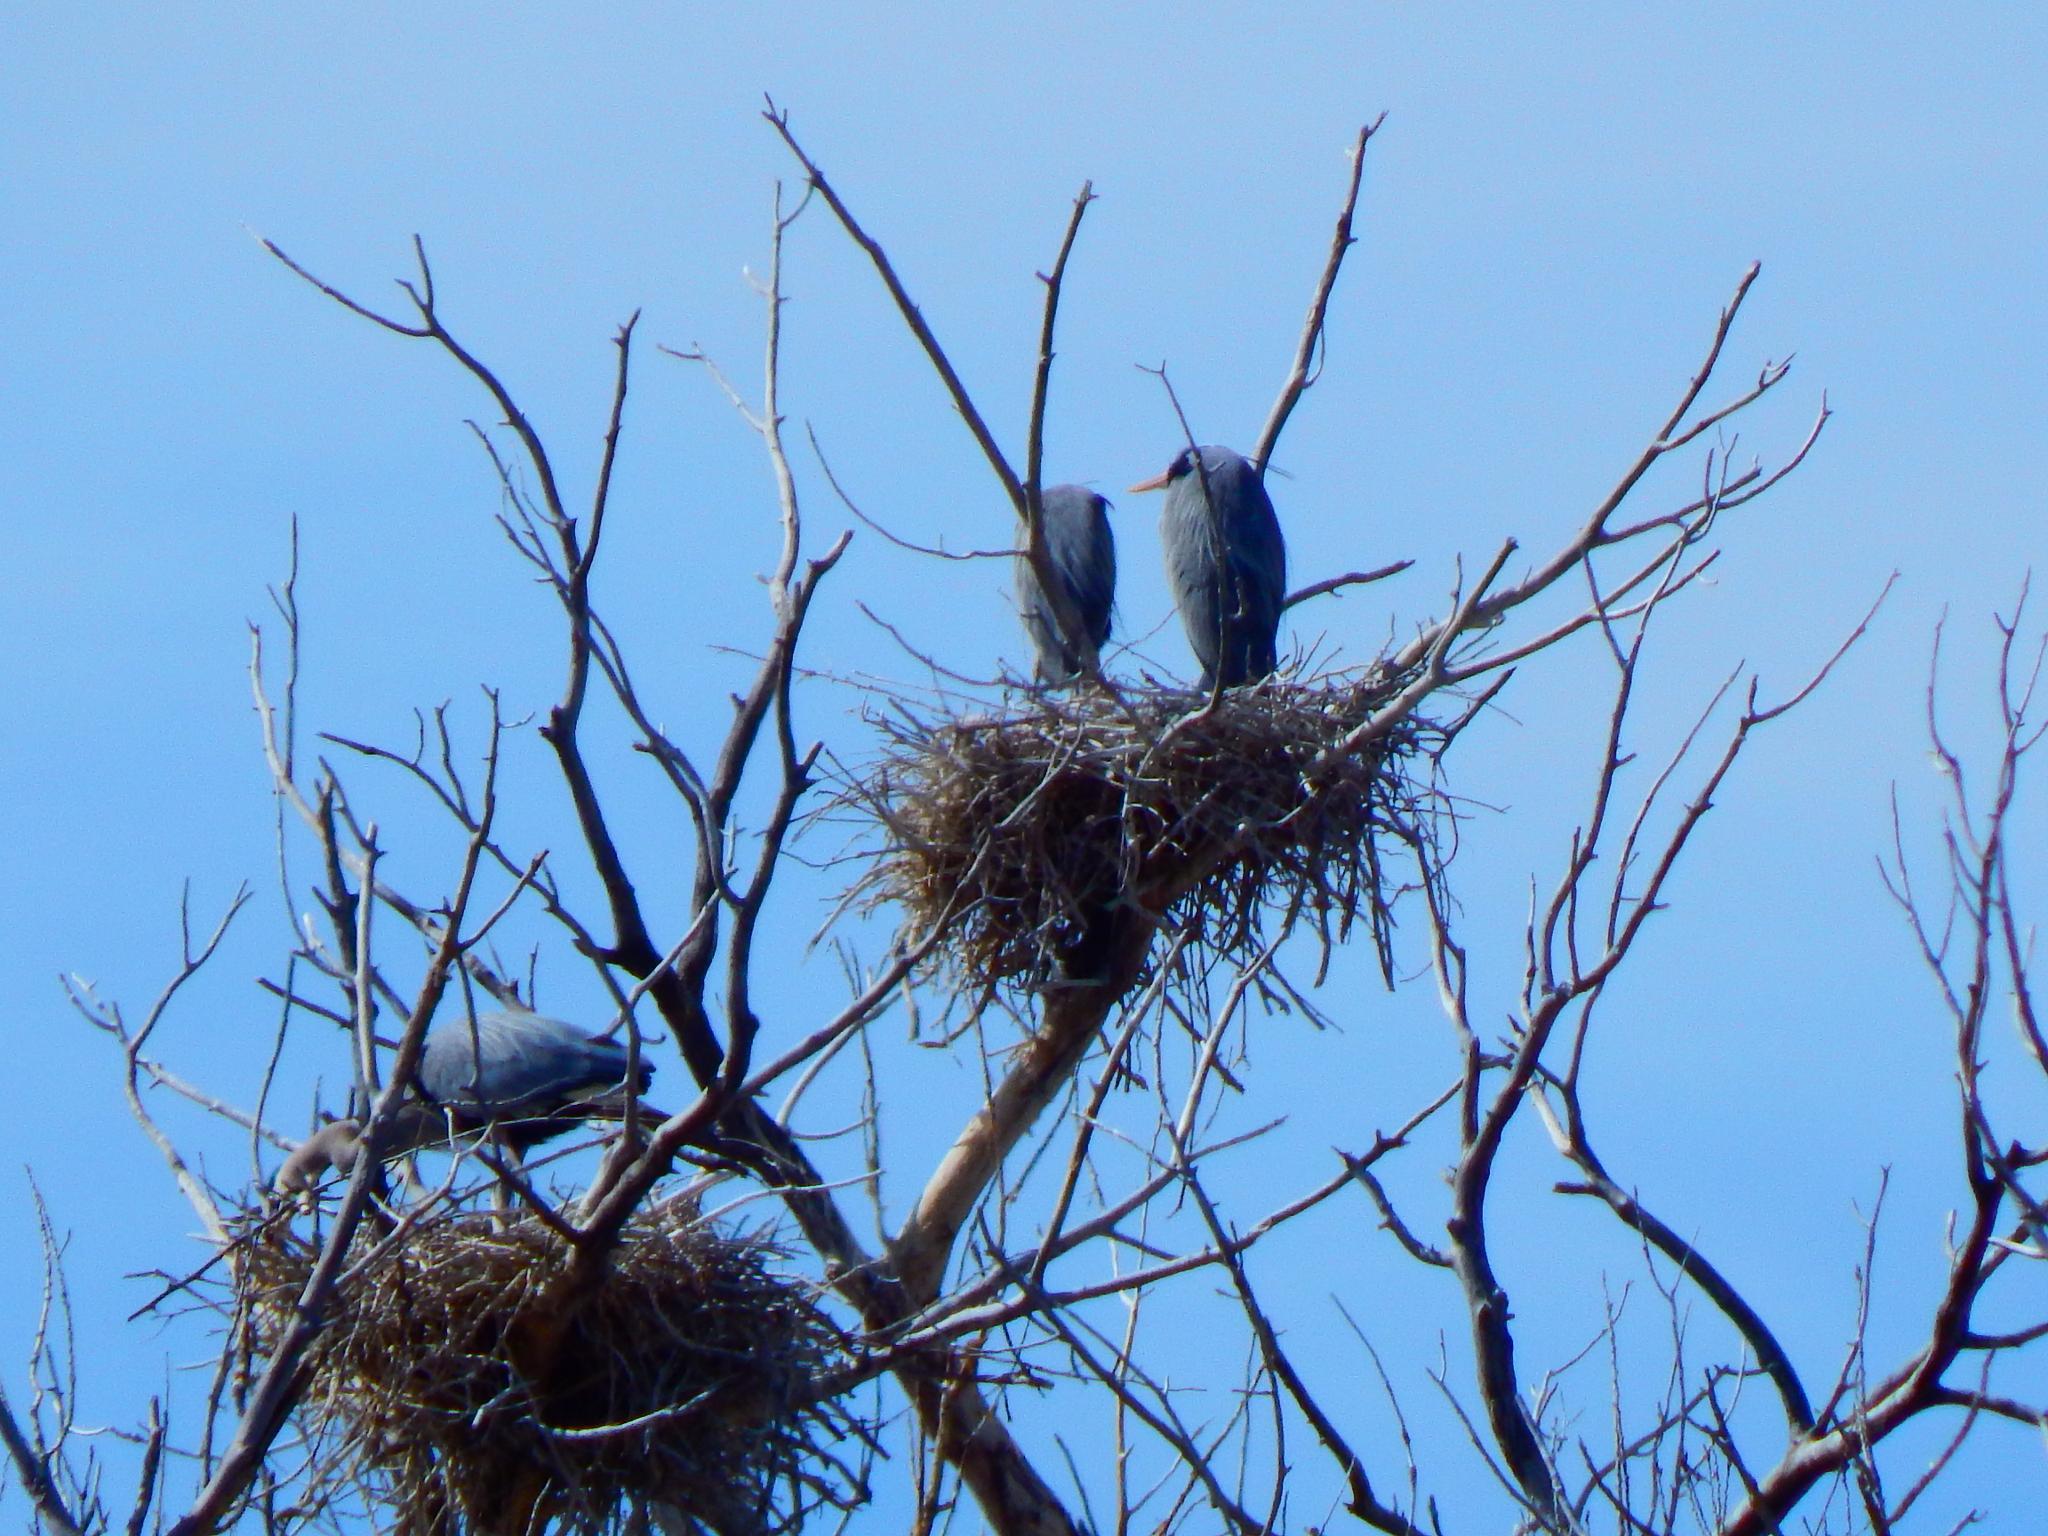 Nesting Season by Mark Court (MyWyomingPhotography)